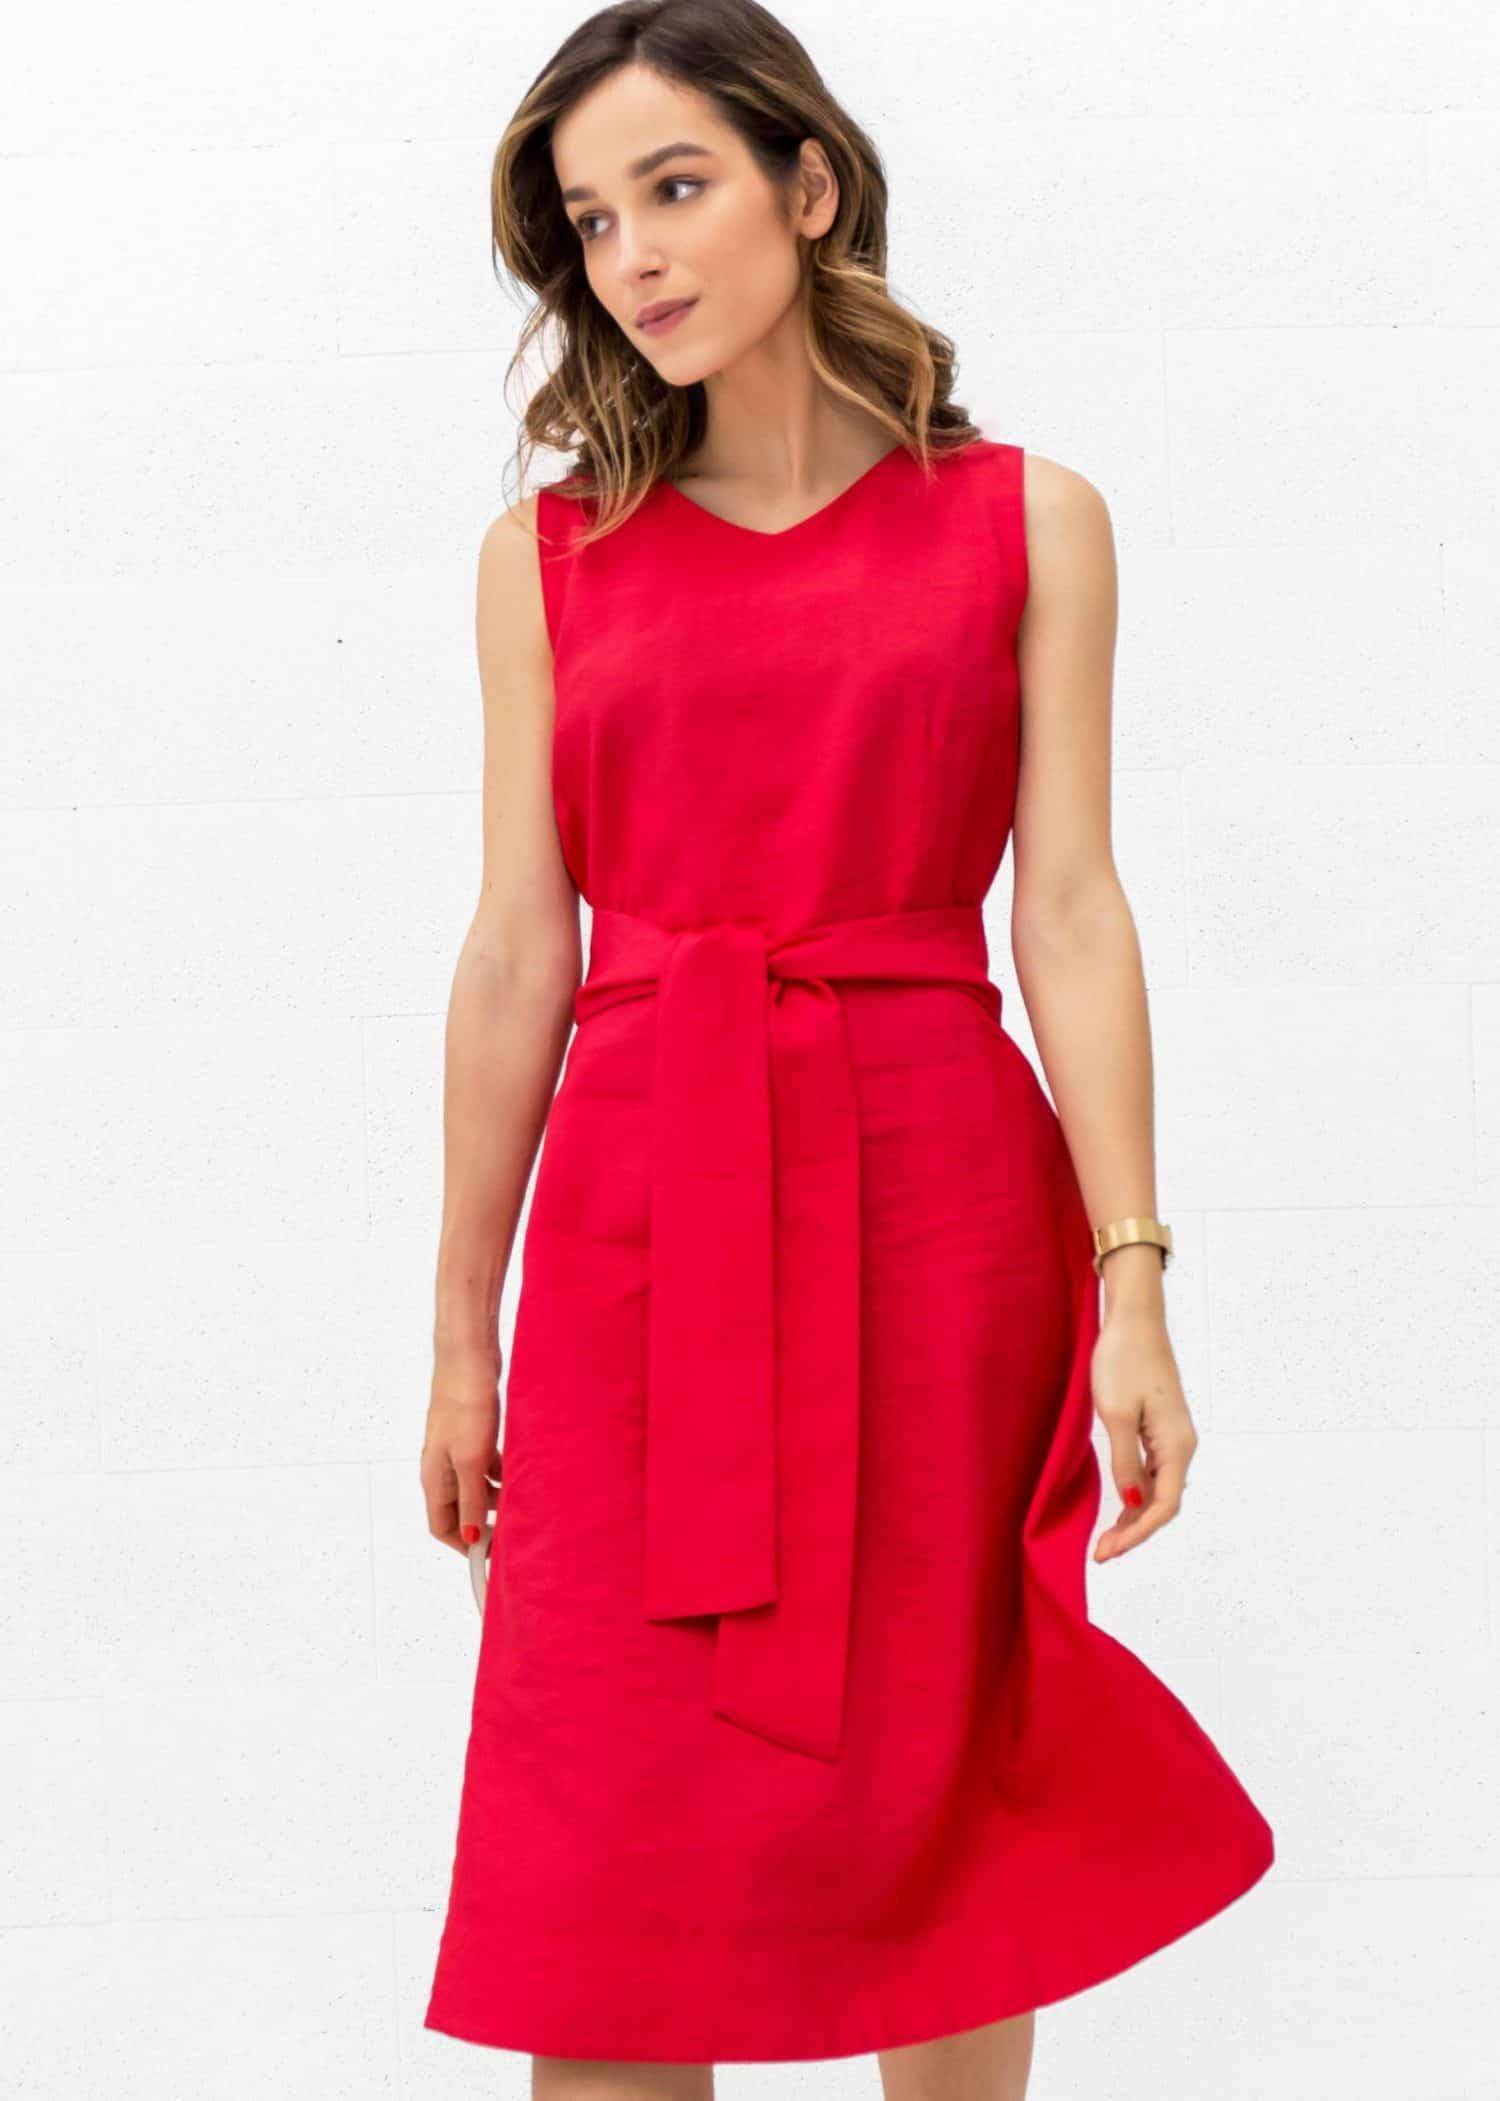 Bright Red Dress Suzie